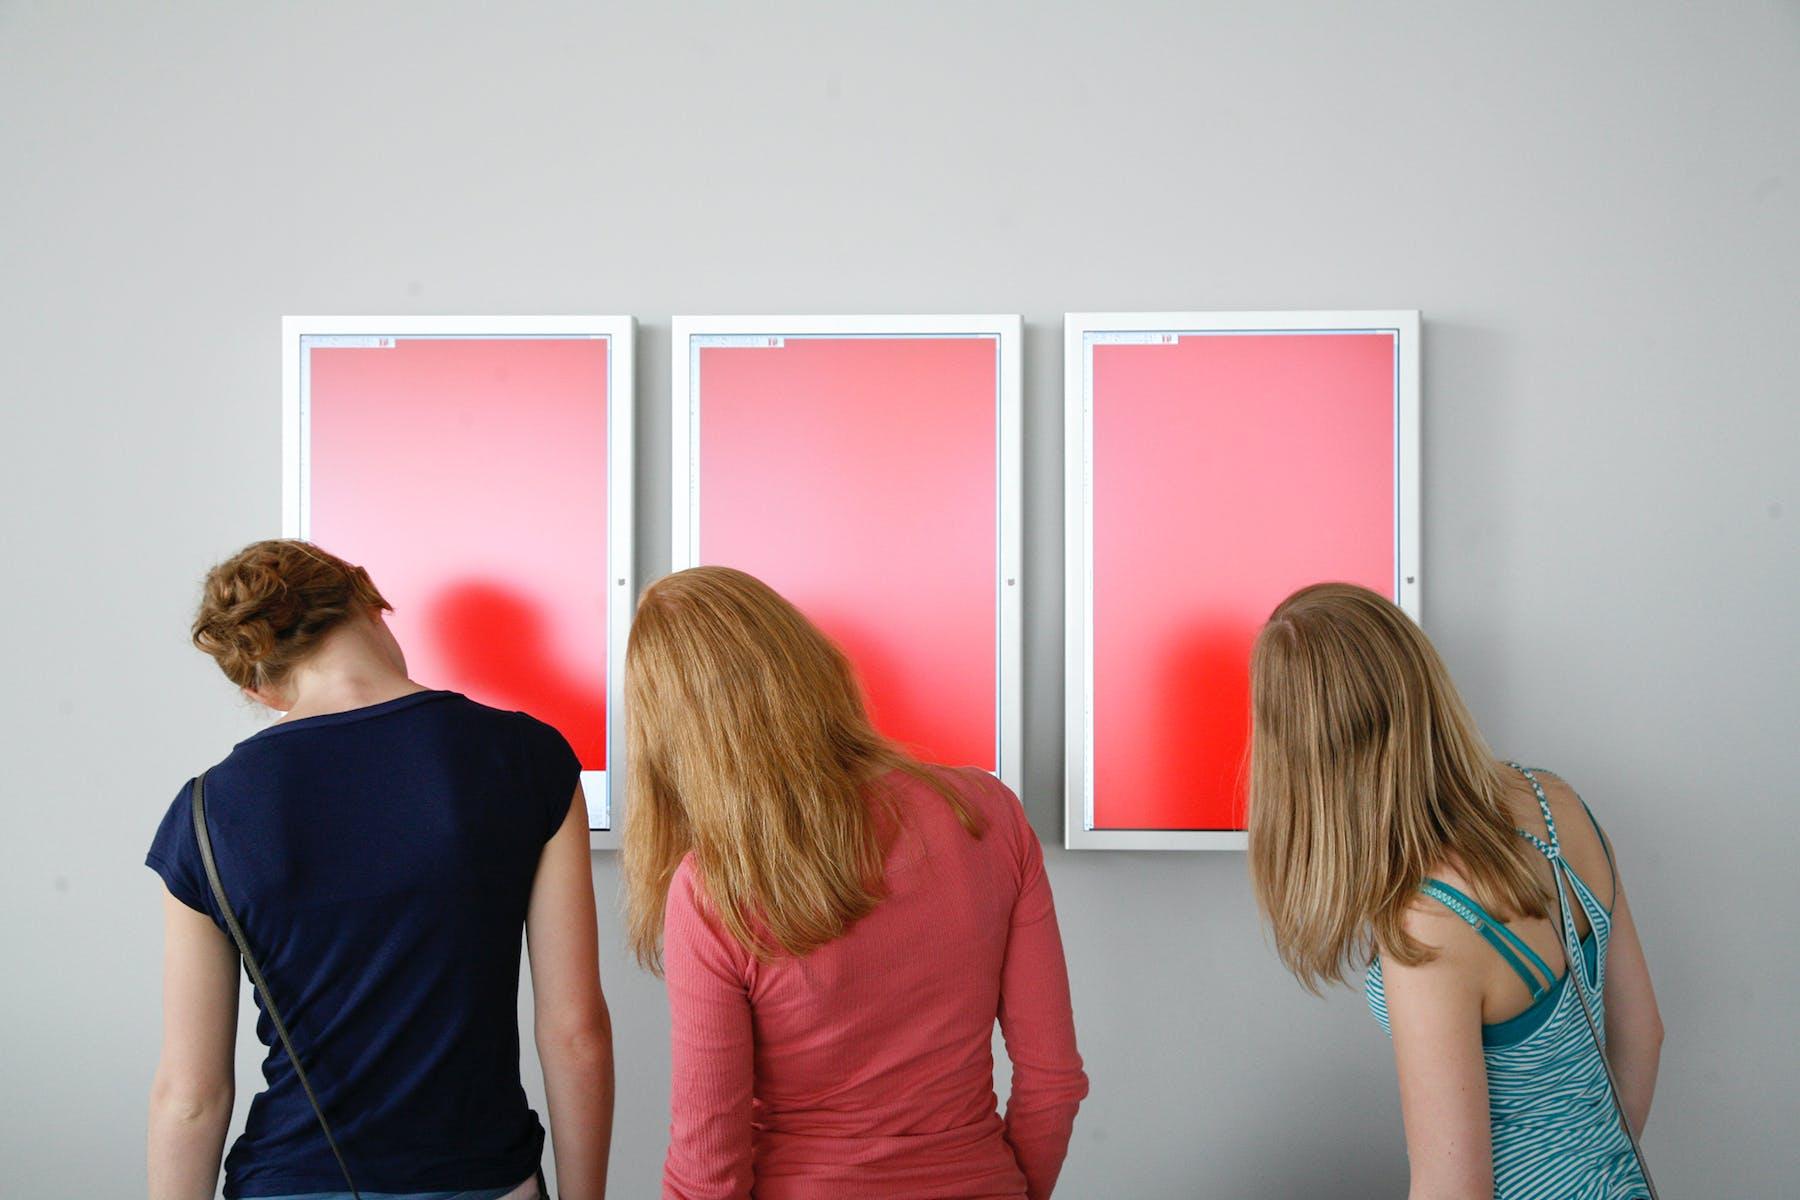 Hito Steyerl, Red Alert, 2007 (installation view)